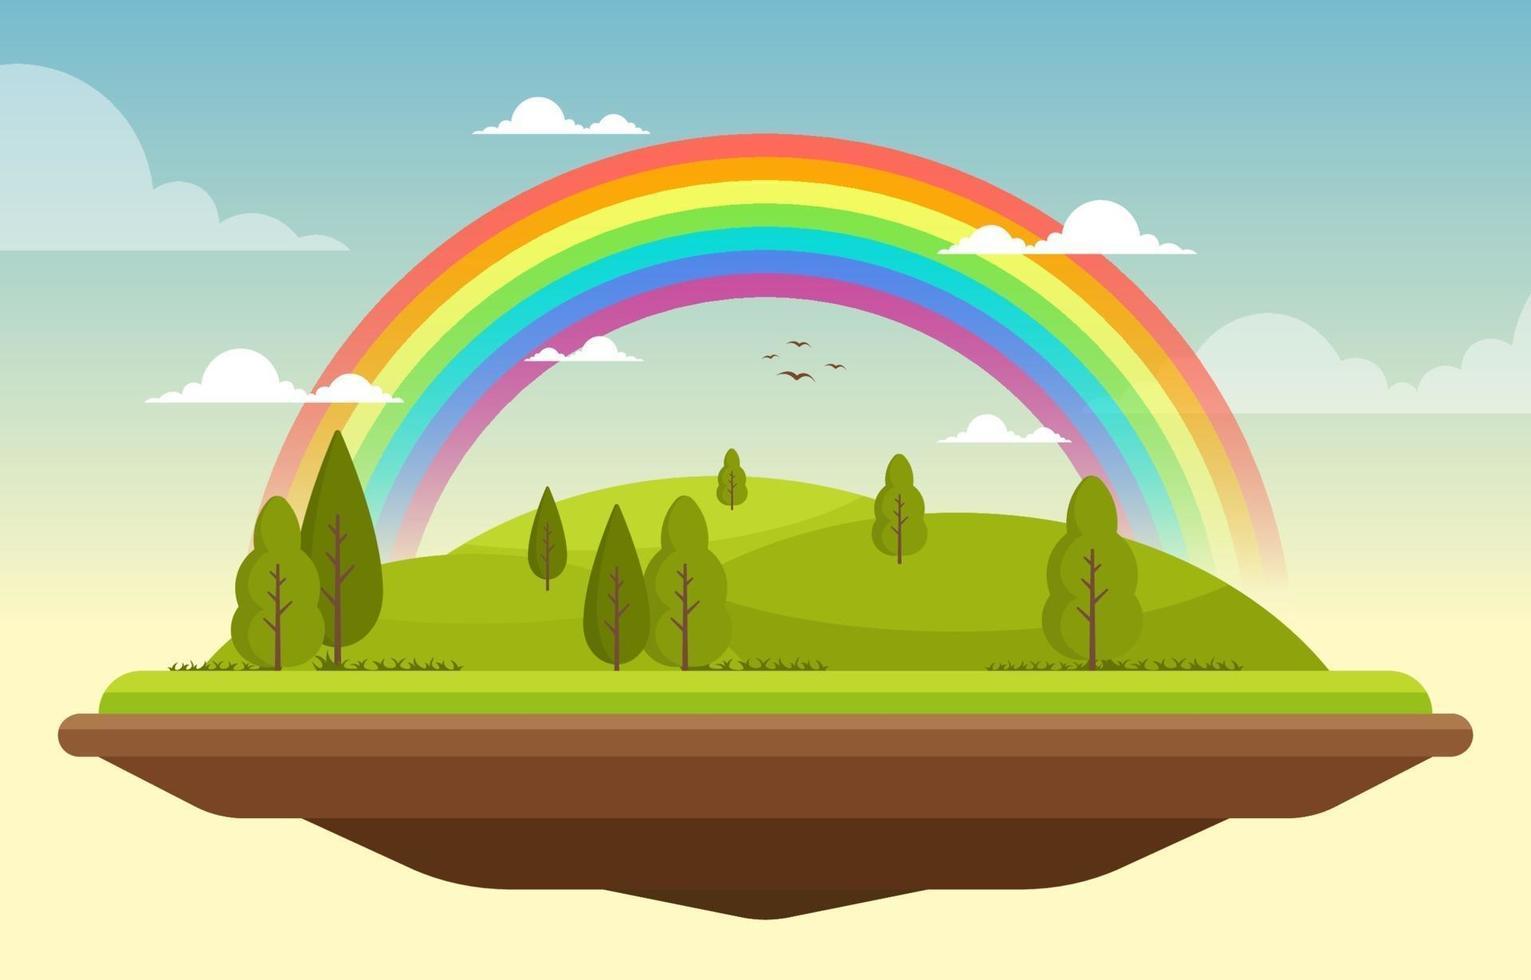 Beautiful Floating Landscape Rainbow Summer Nature Illustration vector